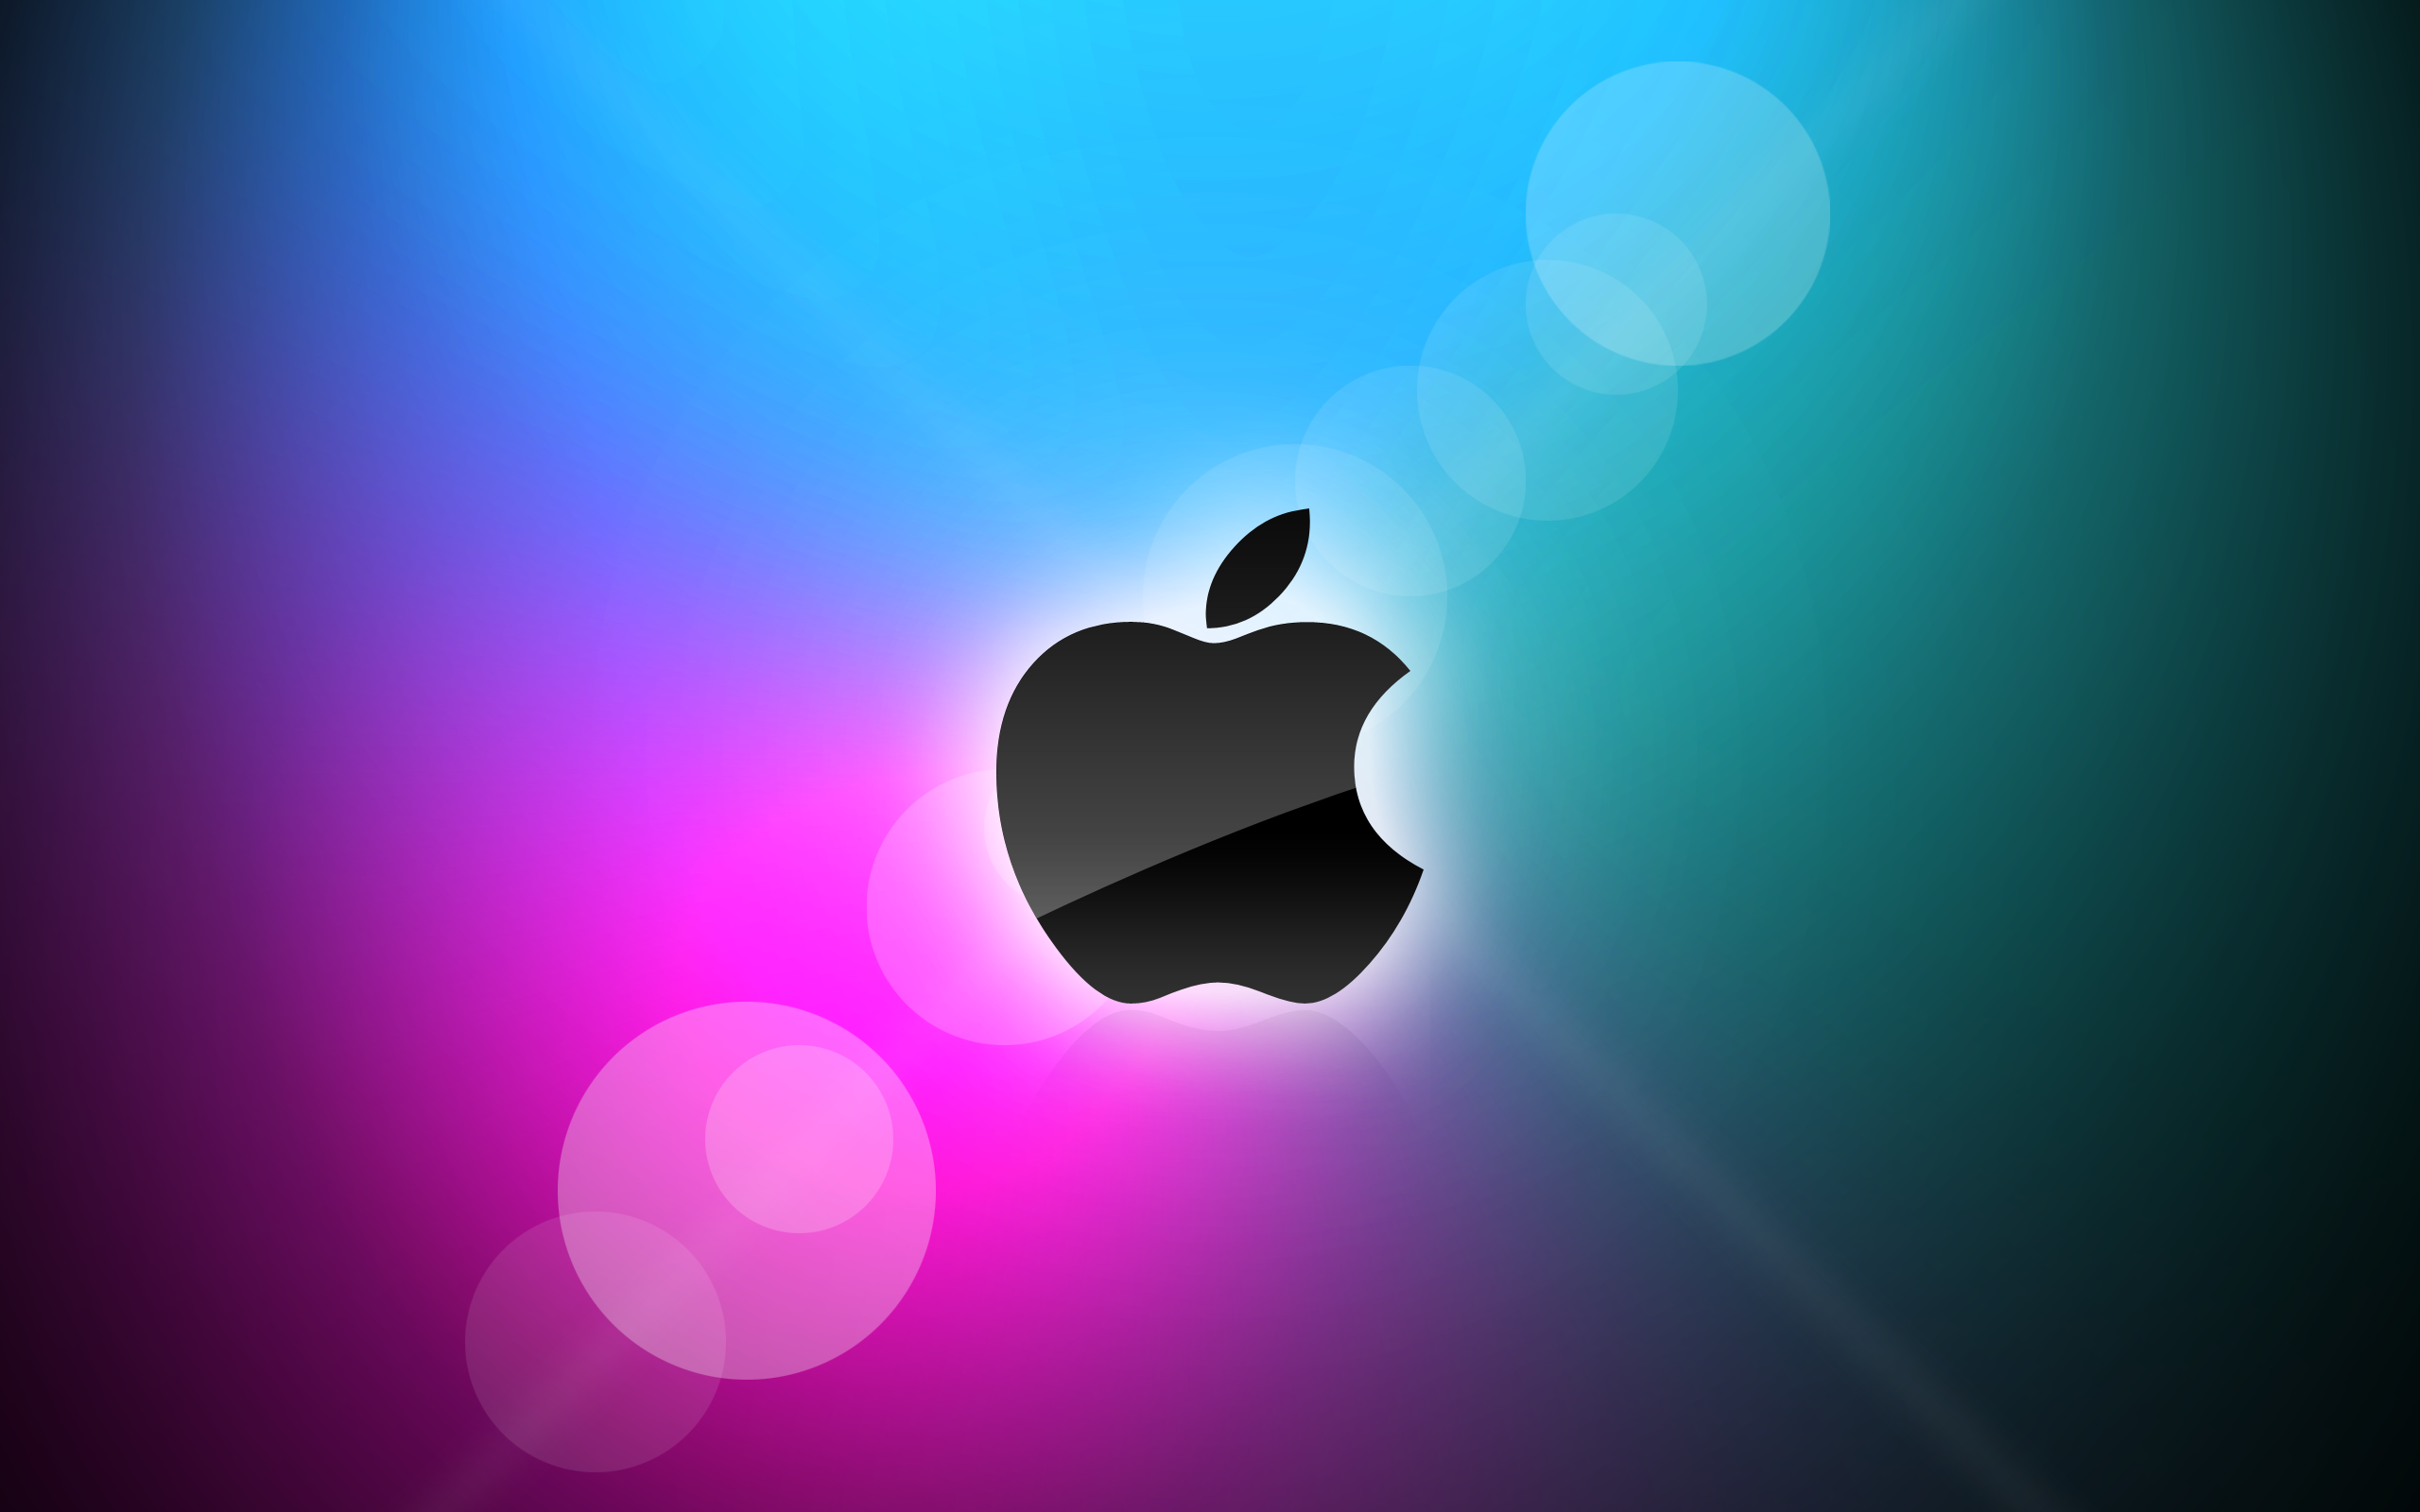 Apple Mac 2560x1600